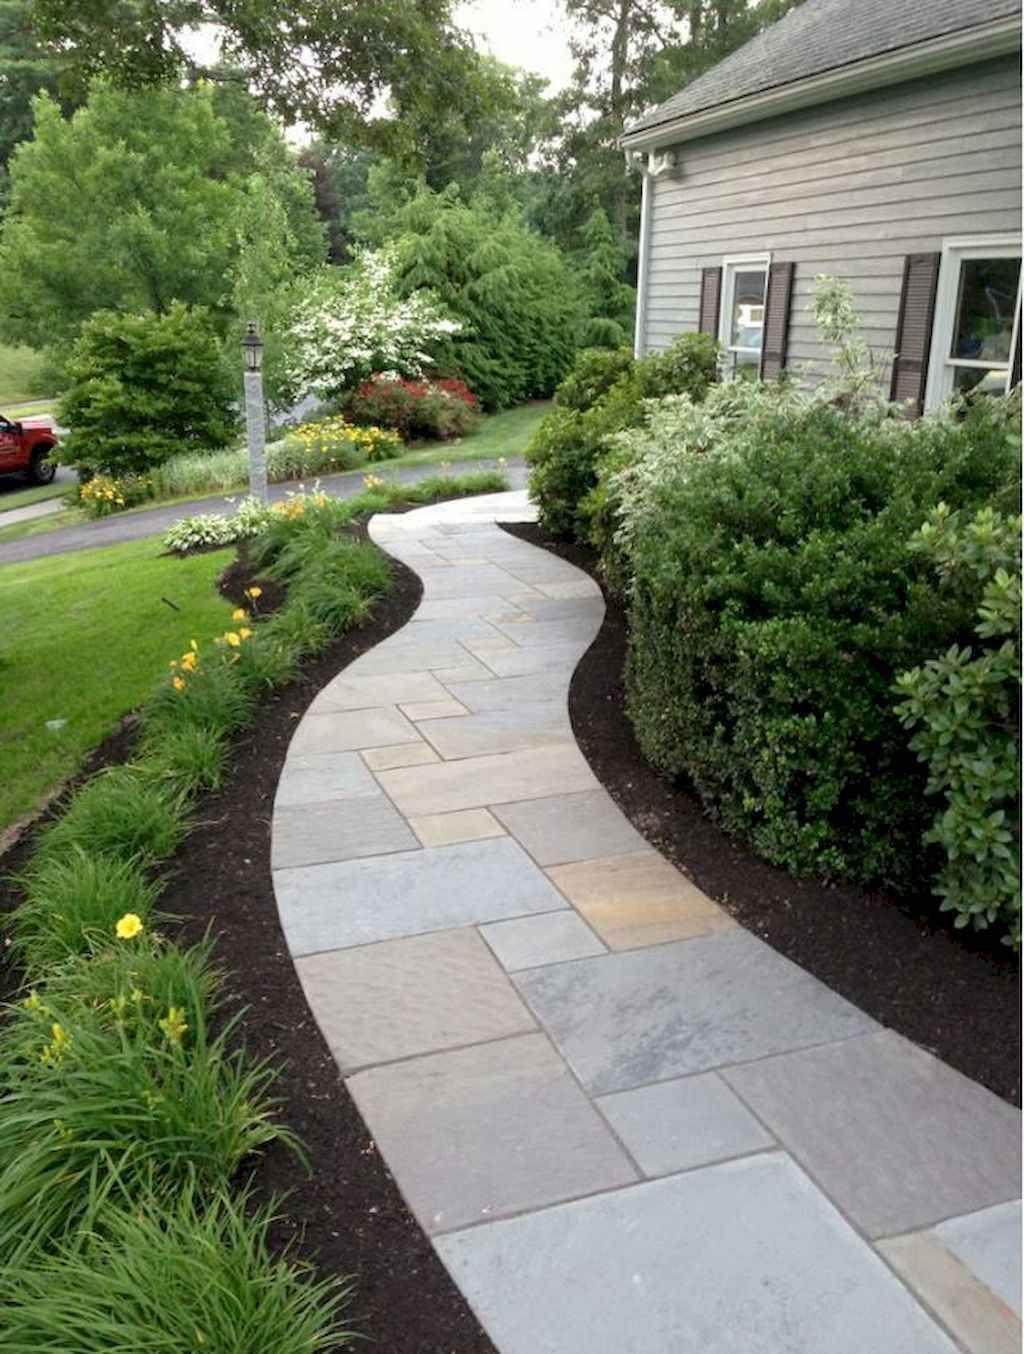 04 beautiful side yard garden path design ideas in 2020 ... on Side Yard Walkway Ideas id=47493